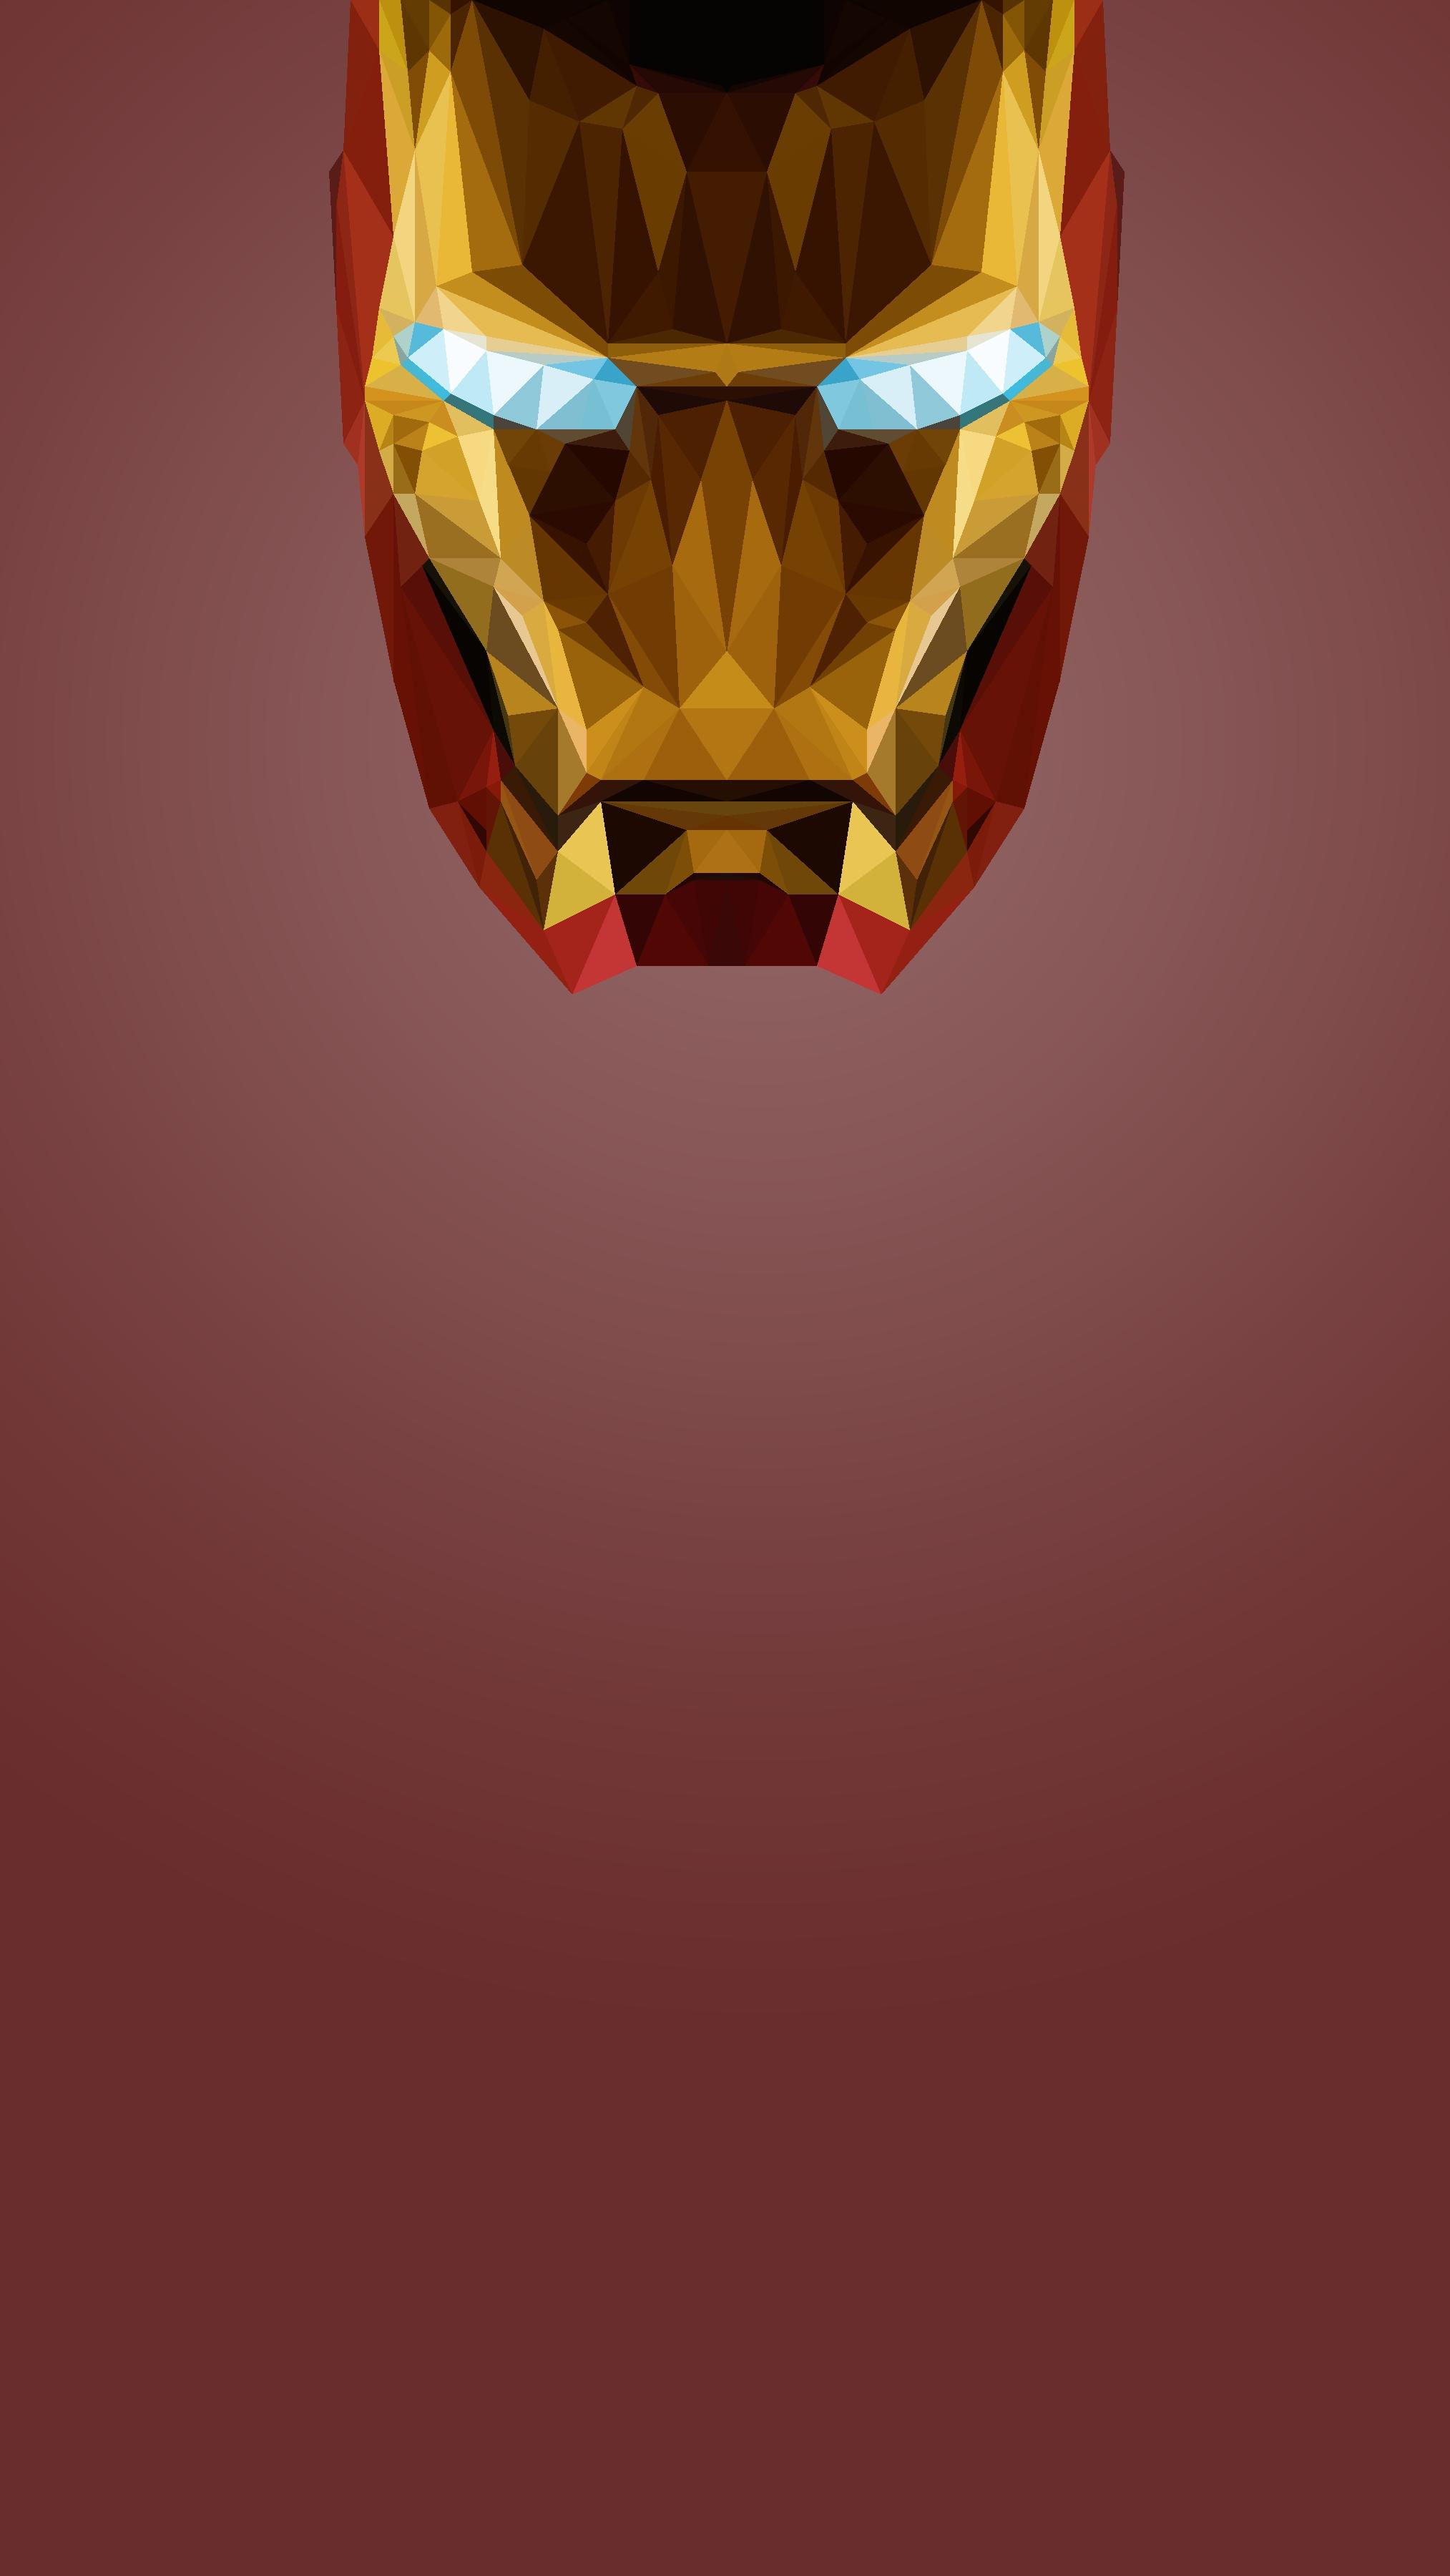 Iron Man Geometric Art iPhone Wallpaper iphoneswallpapers com